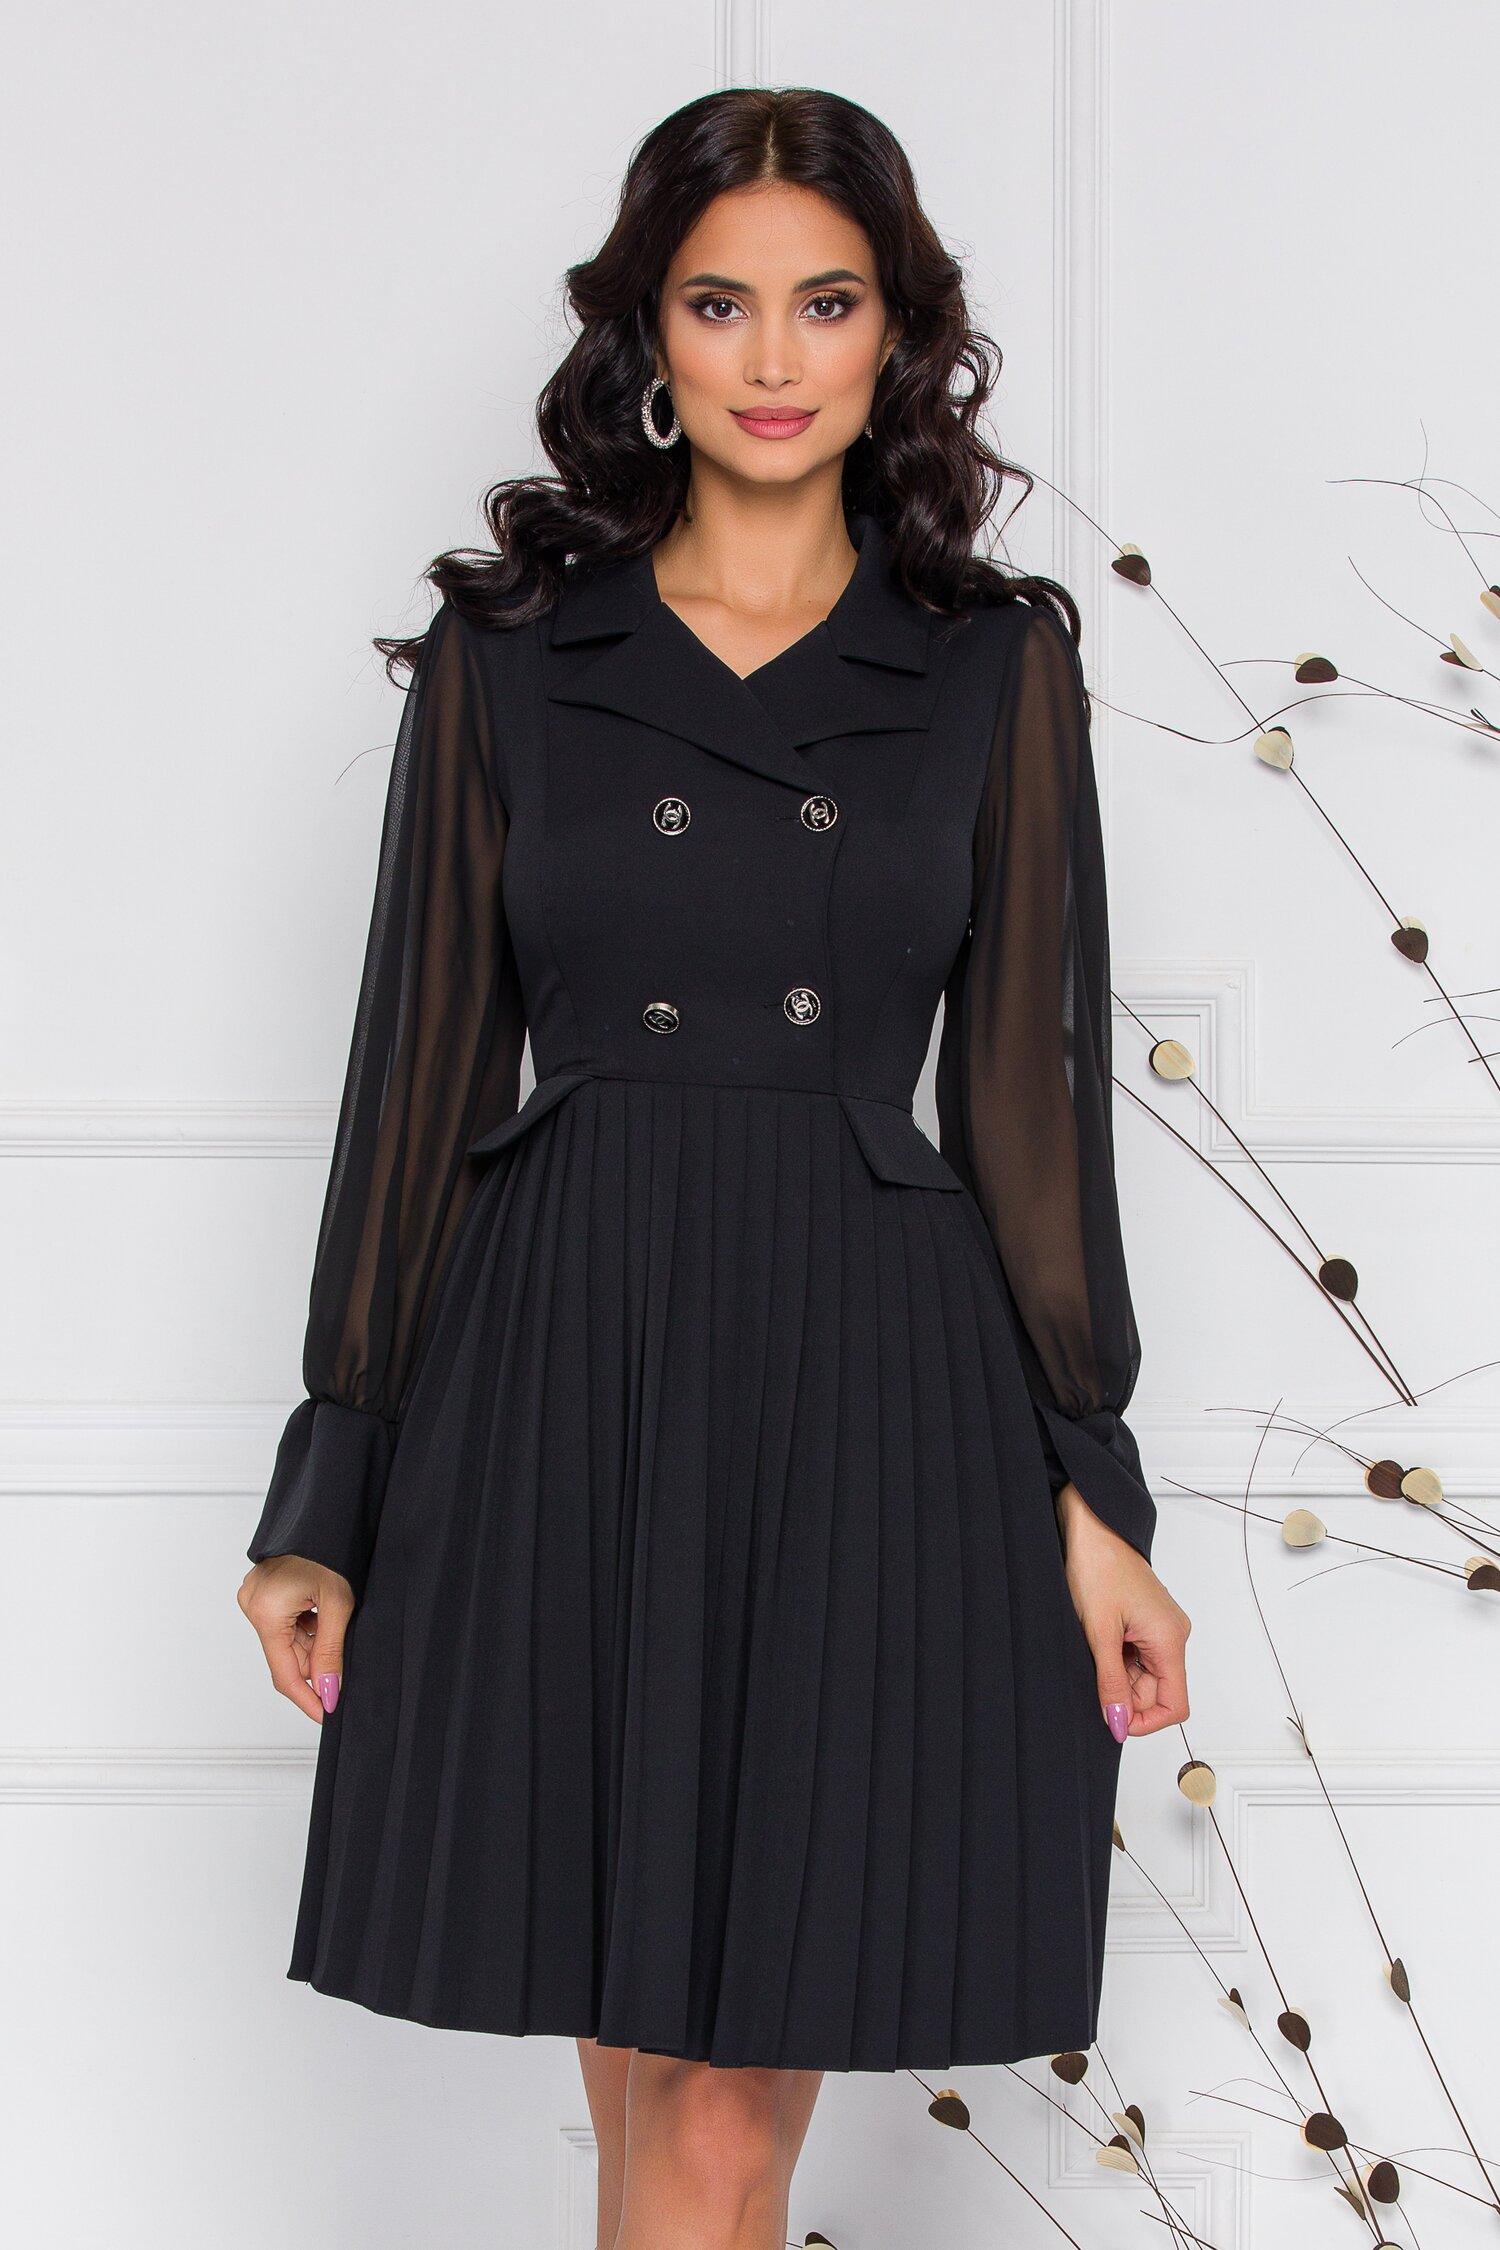 Rochie Margot neagra cu pliuri pe fusta